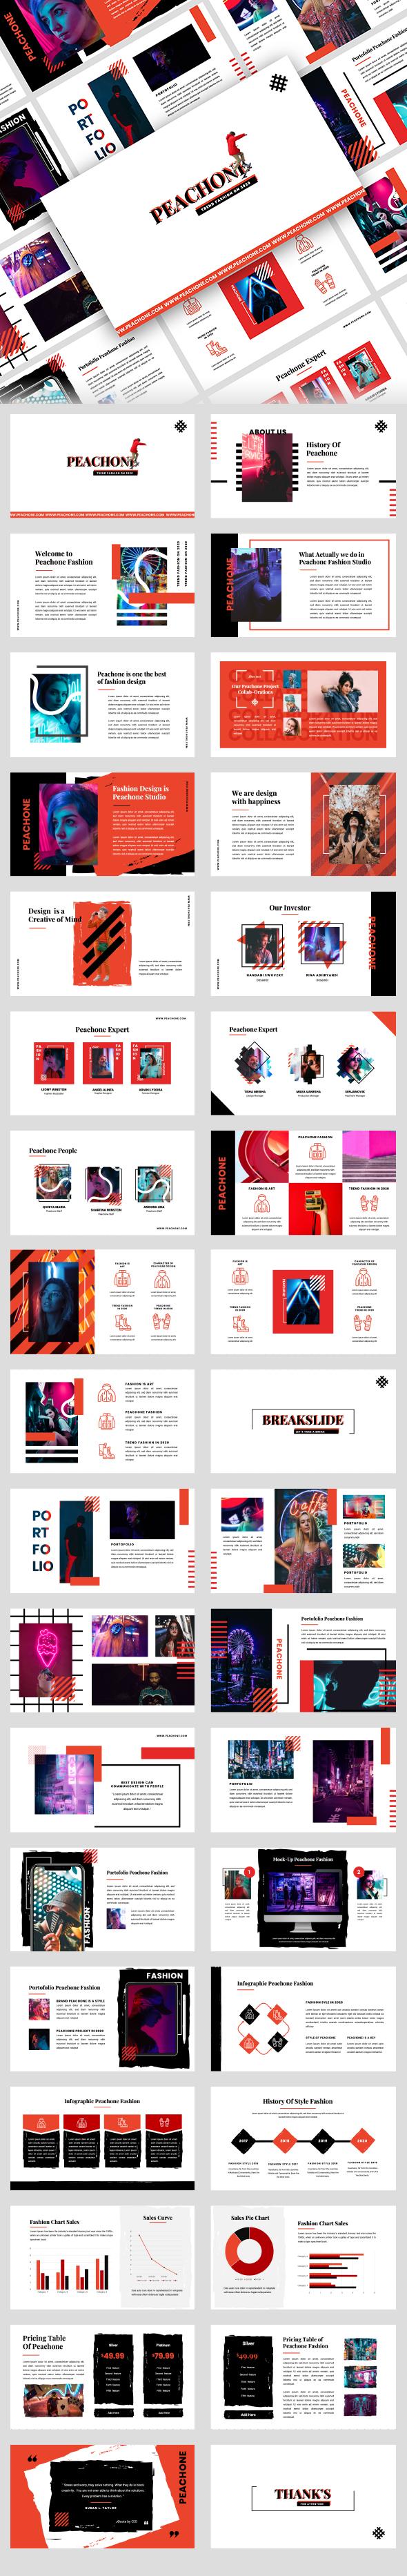 Peachone - Fashion Creative Google Slides Presentation